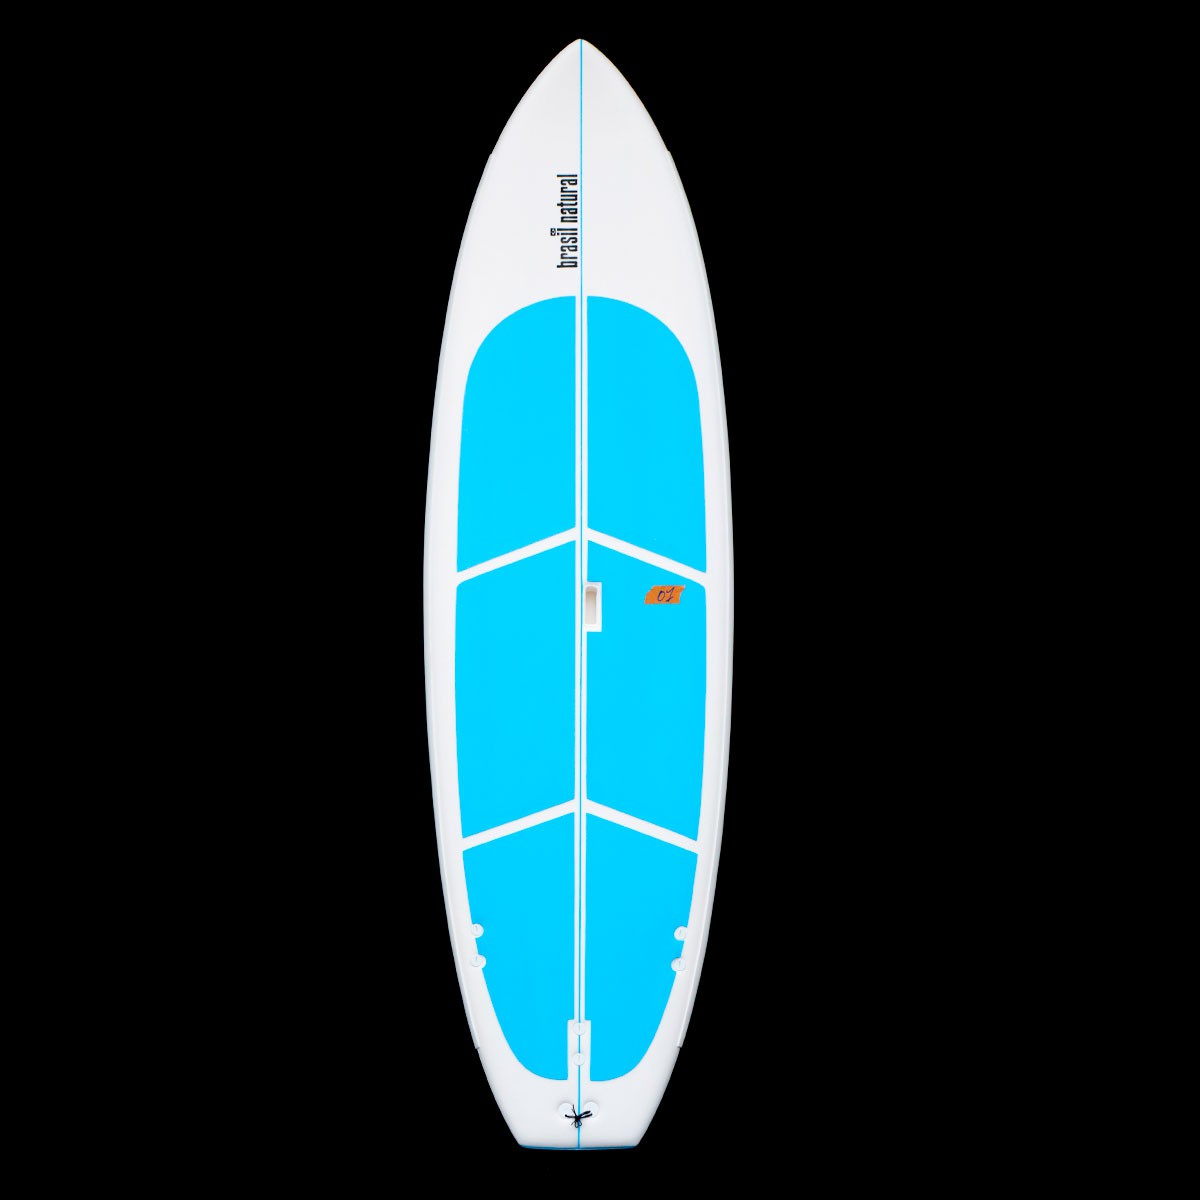 Prancha de stand up paddle 10 pés soft  rígido + kit remada OUTLET001